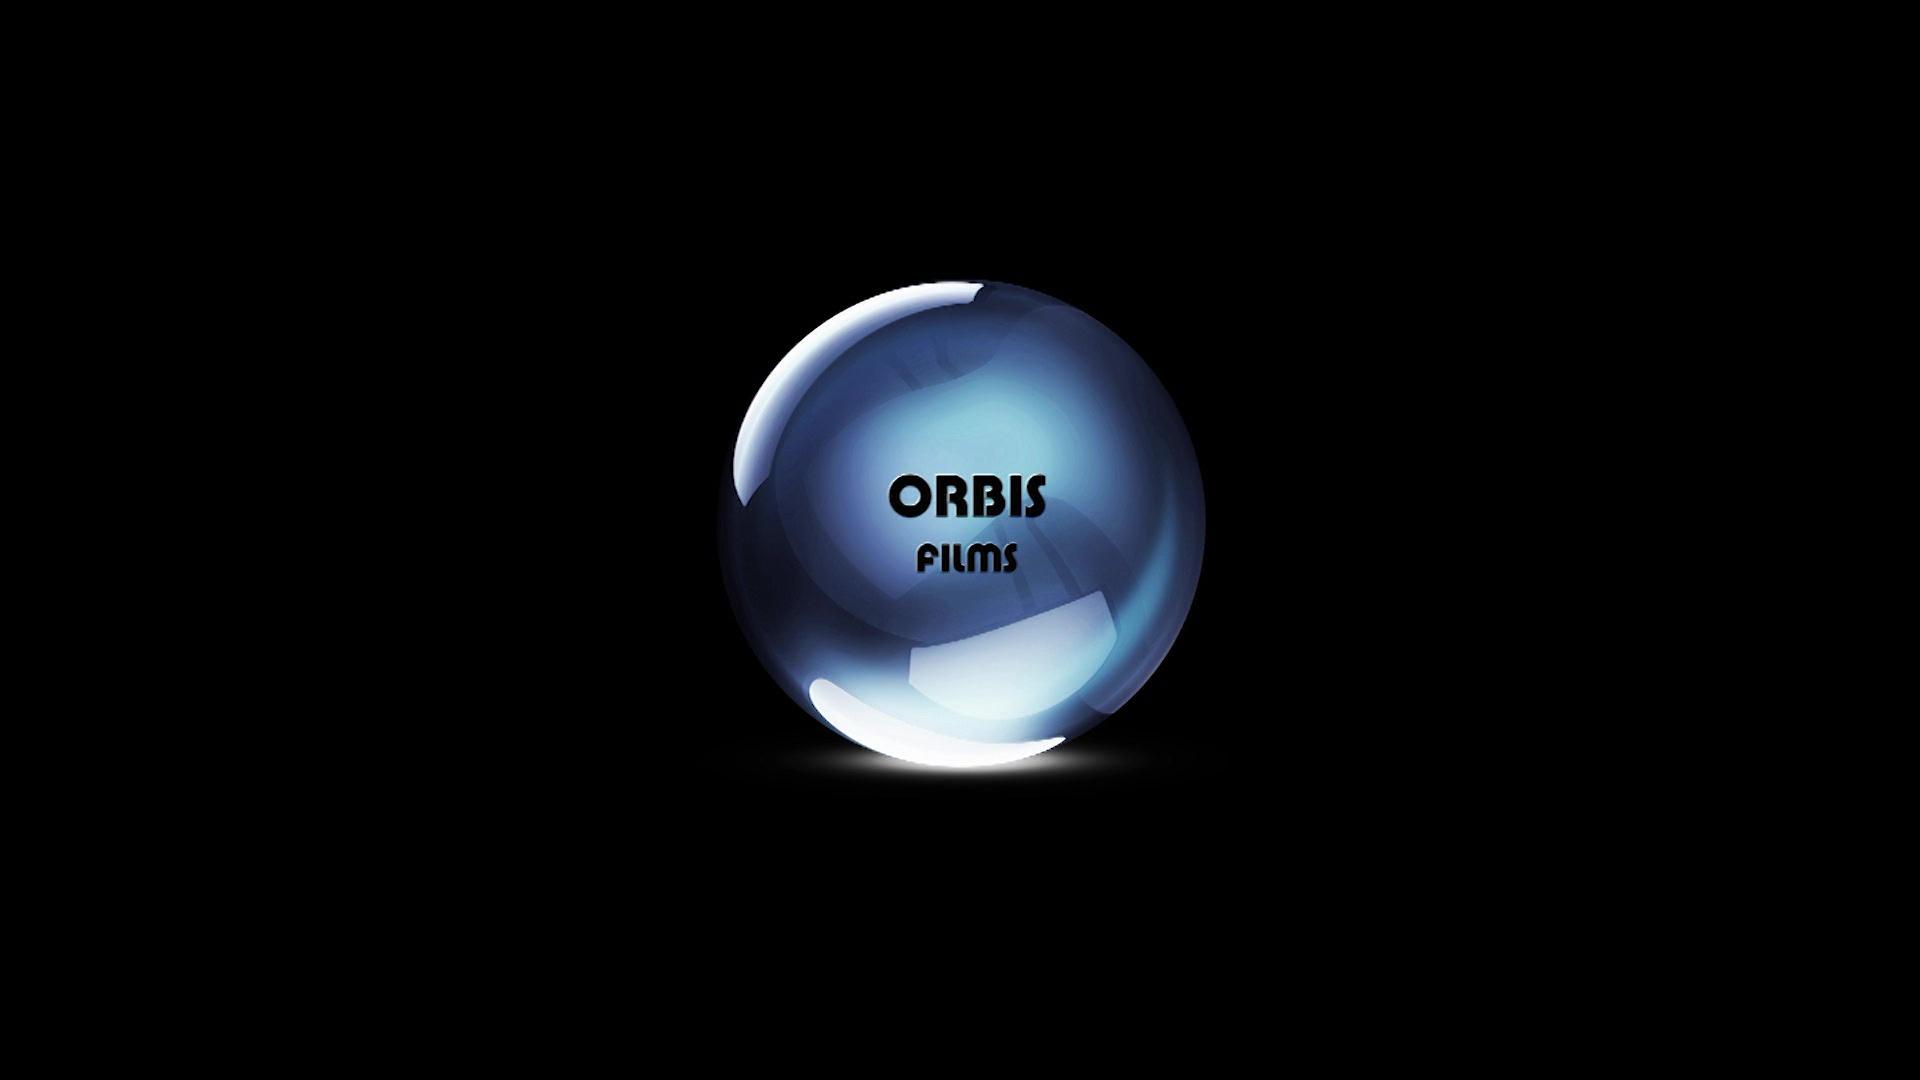 Orbis Films